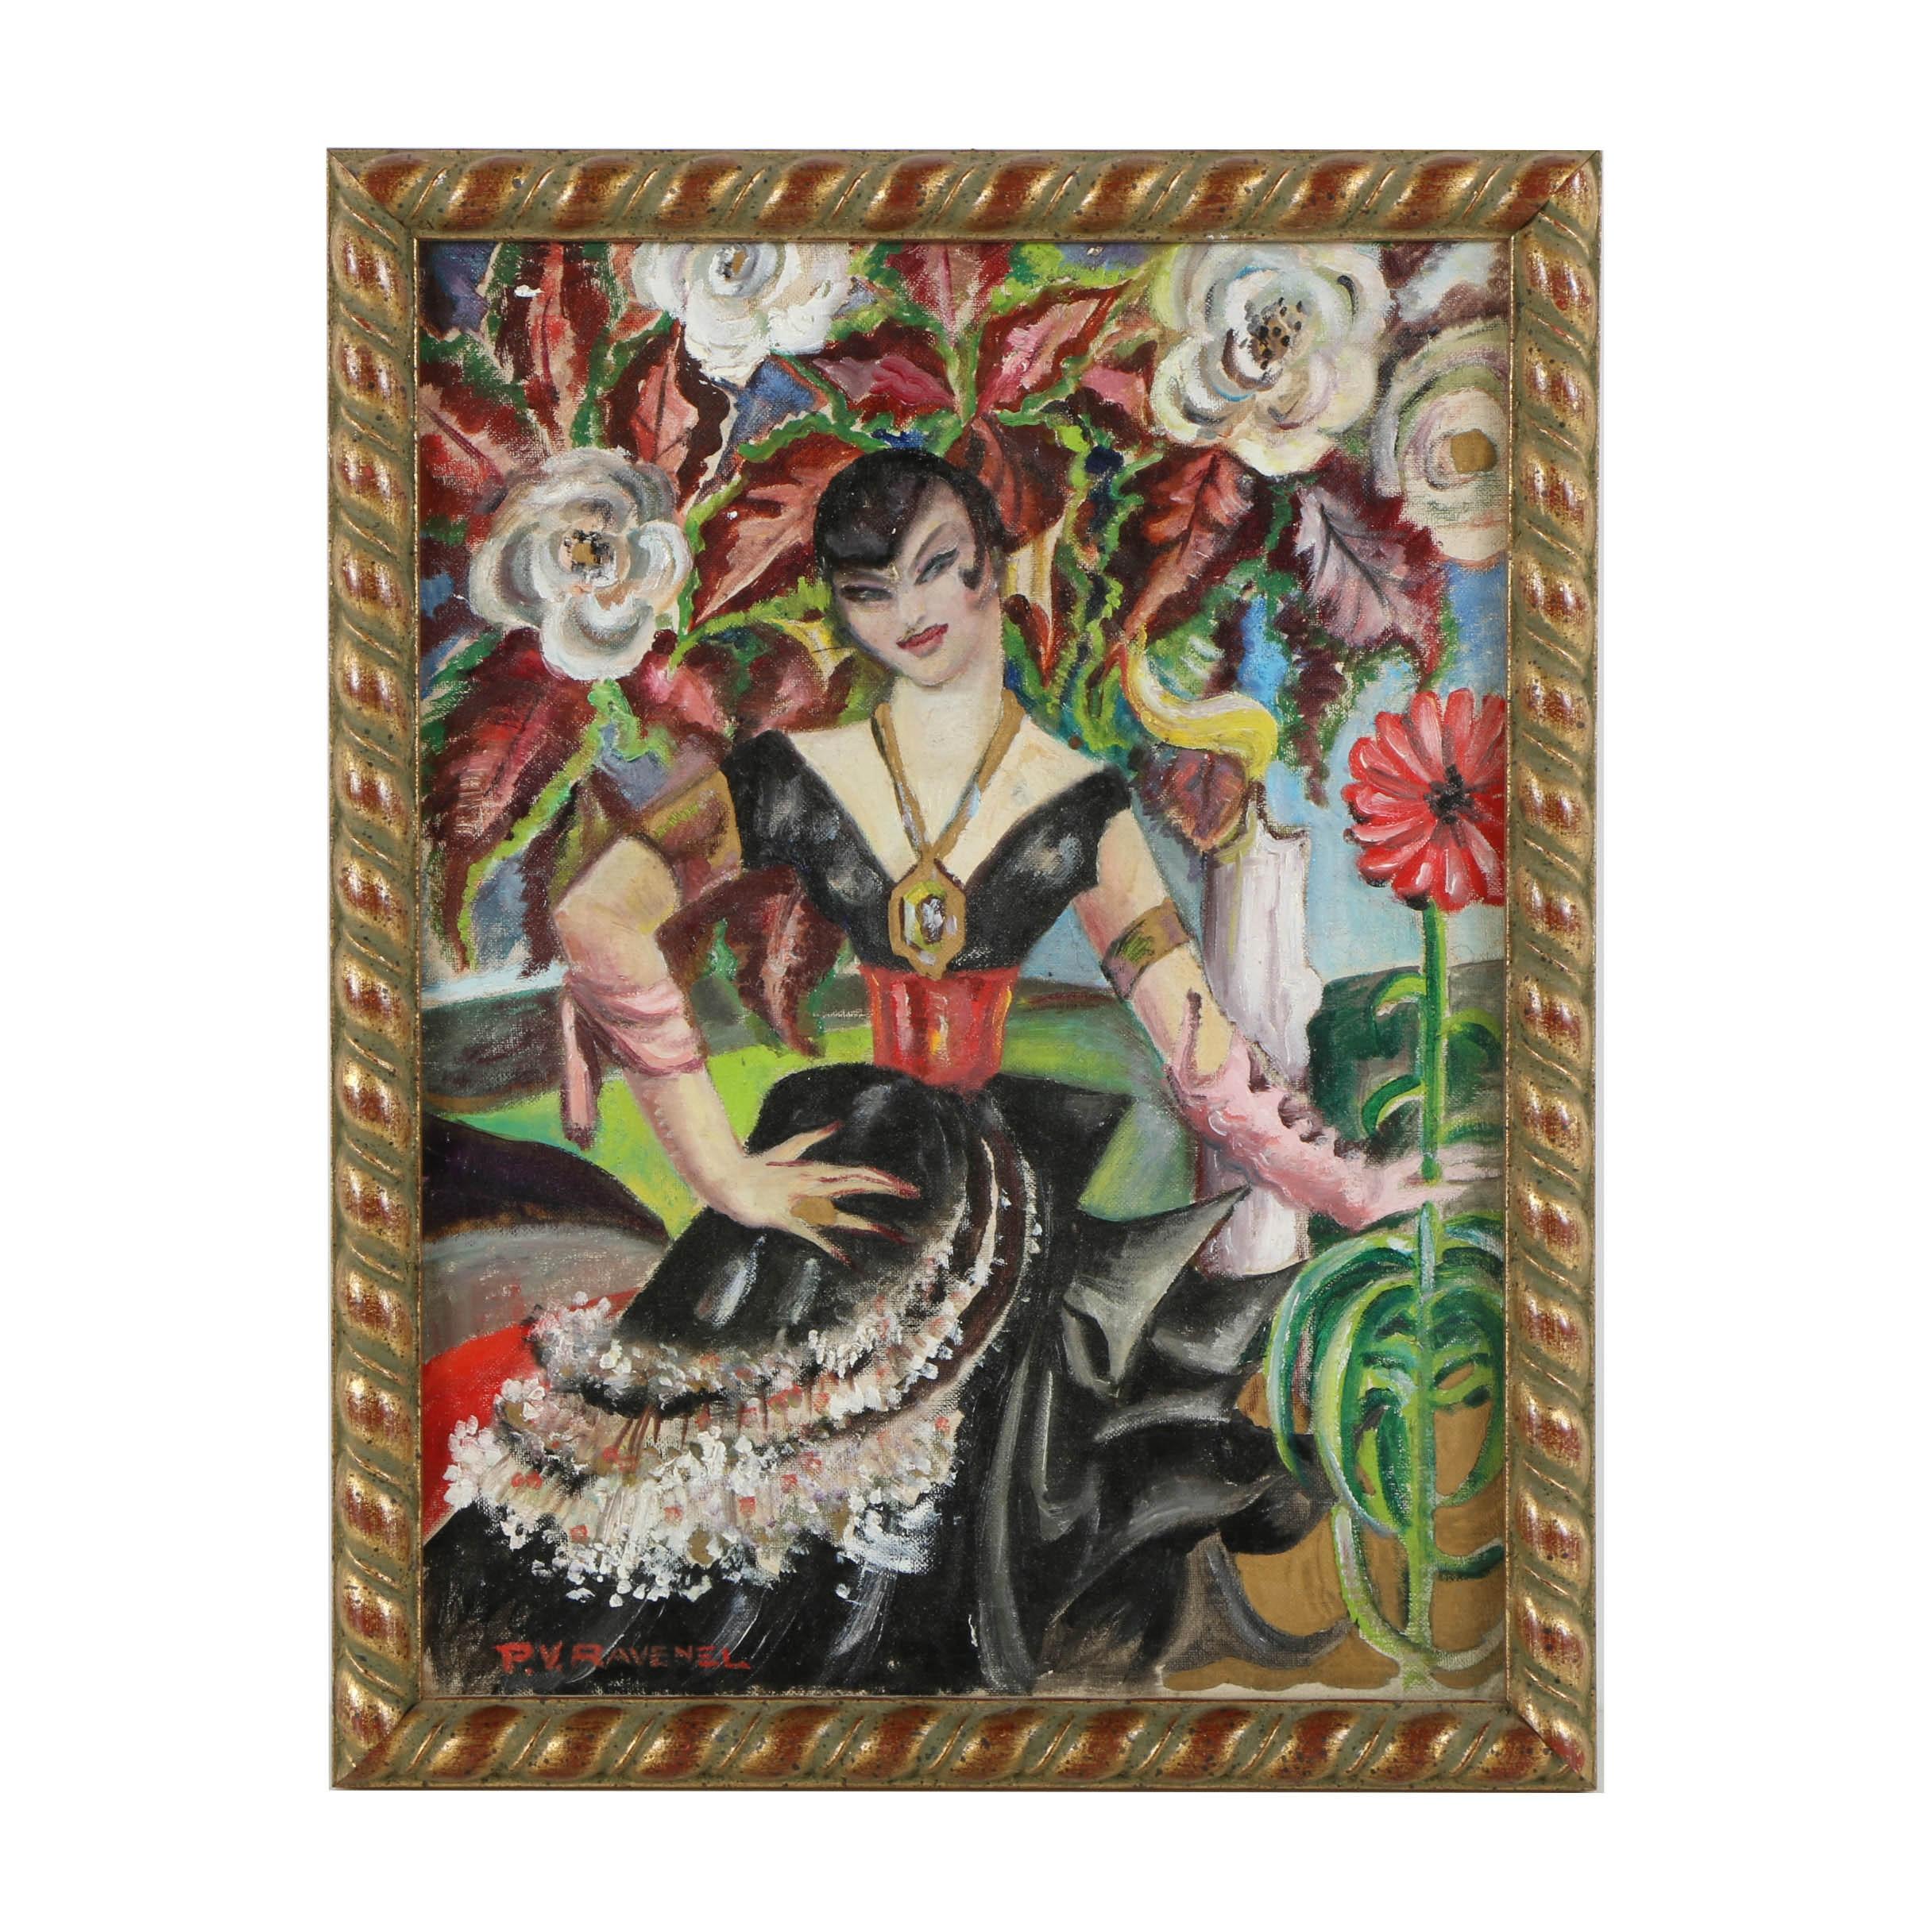 Pamela Ravenel Oil Painting on Canvas Board of a Female Portrait